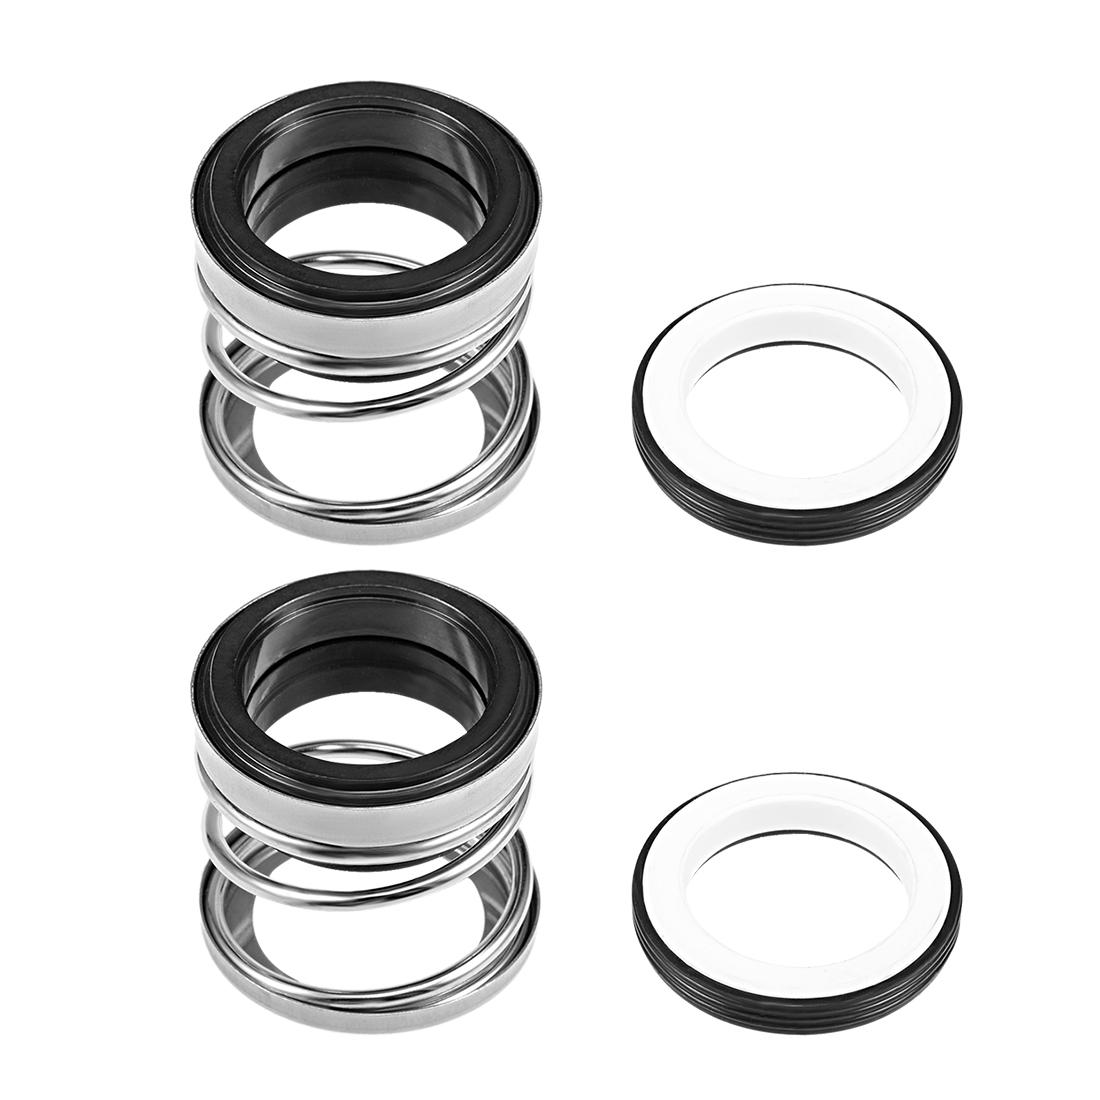 Mechanical Shaft Seal Replacement for Pool Spa Pump 2pcs 108-30 - image 4 de 4